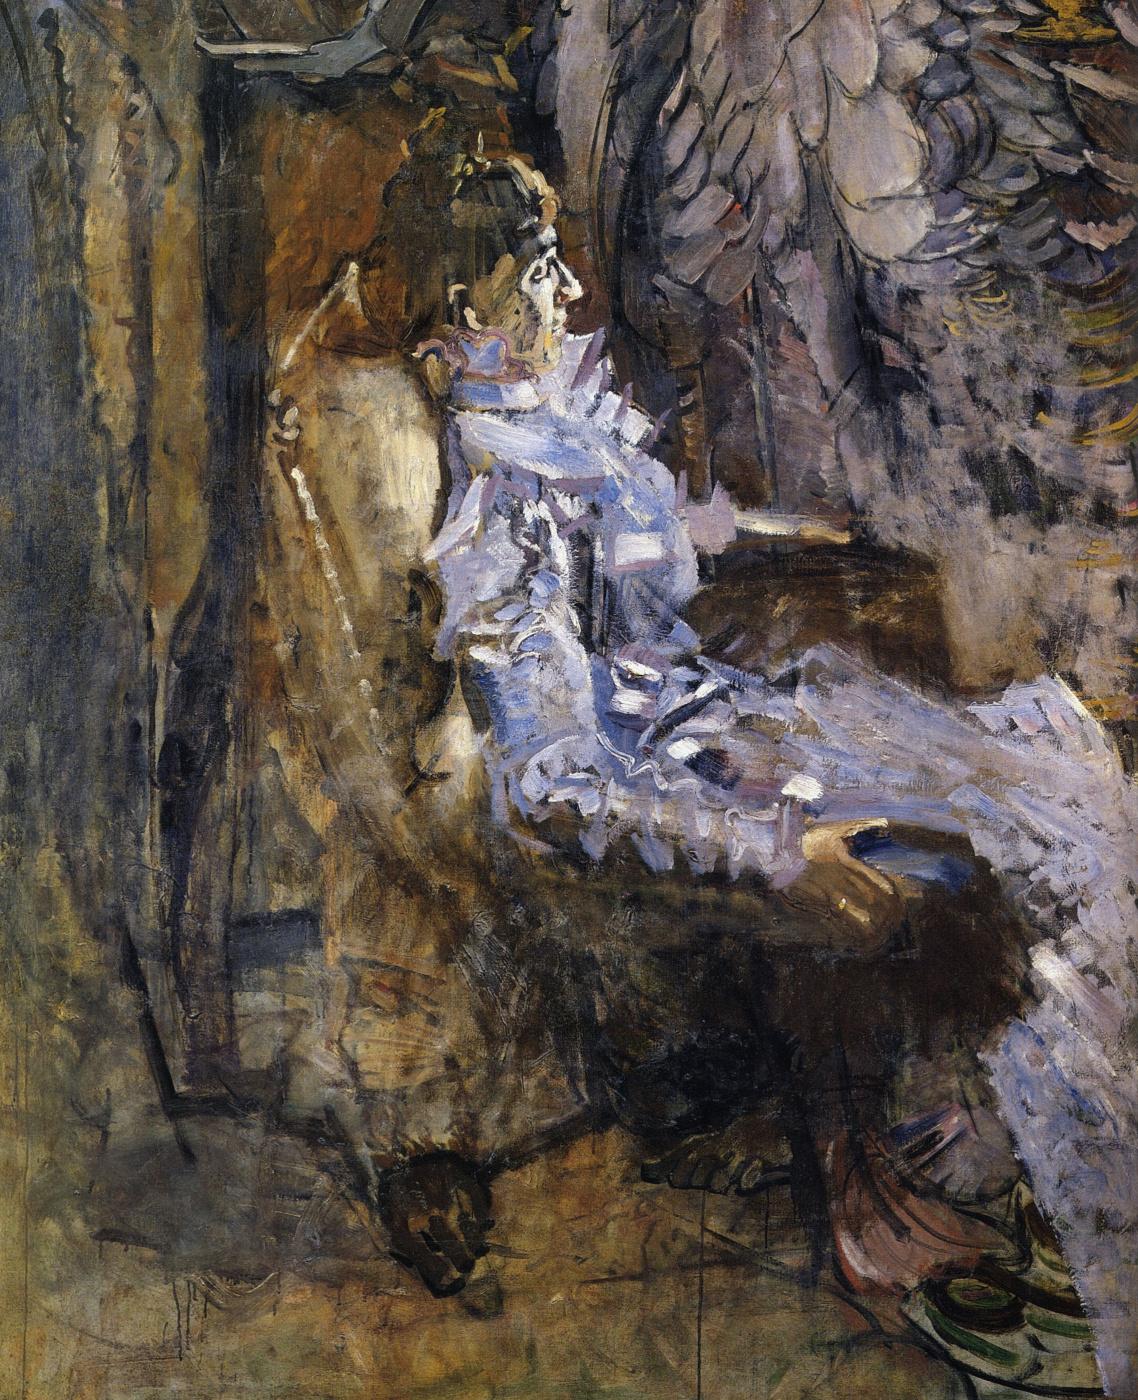 Mikhail Vrubel. The lady in purple. Portrait Of Nadezhda Ivanovna Zabela-Vrubel